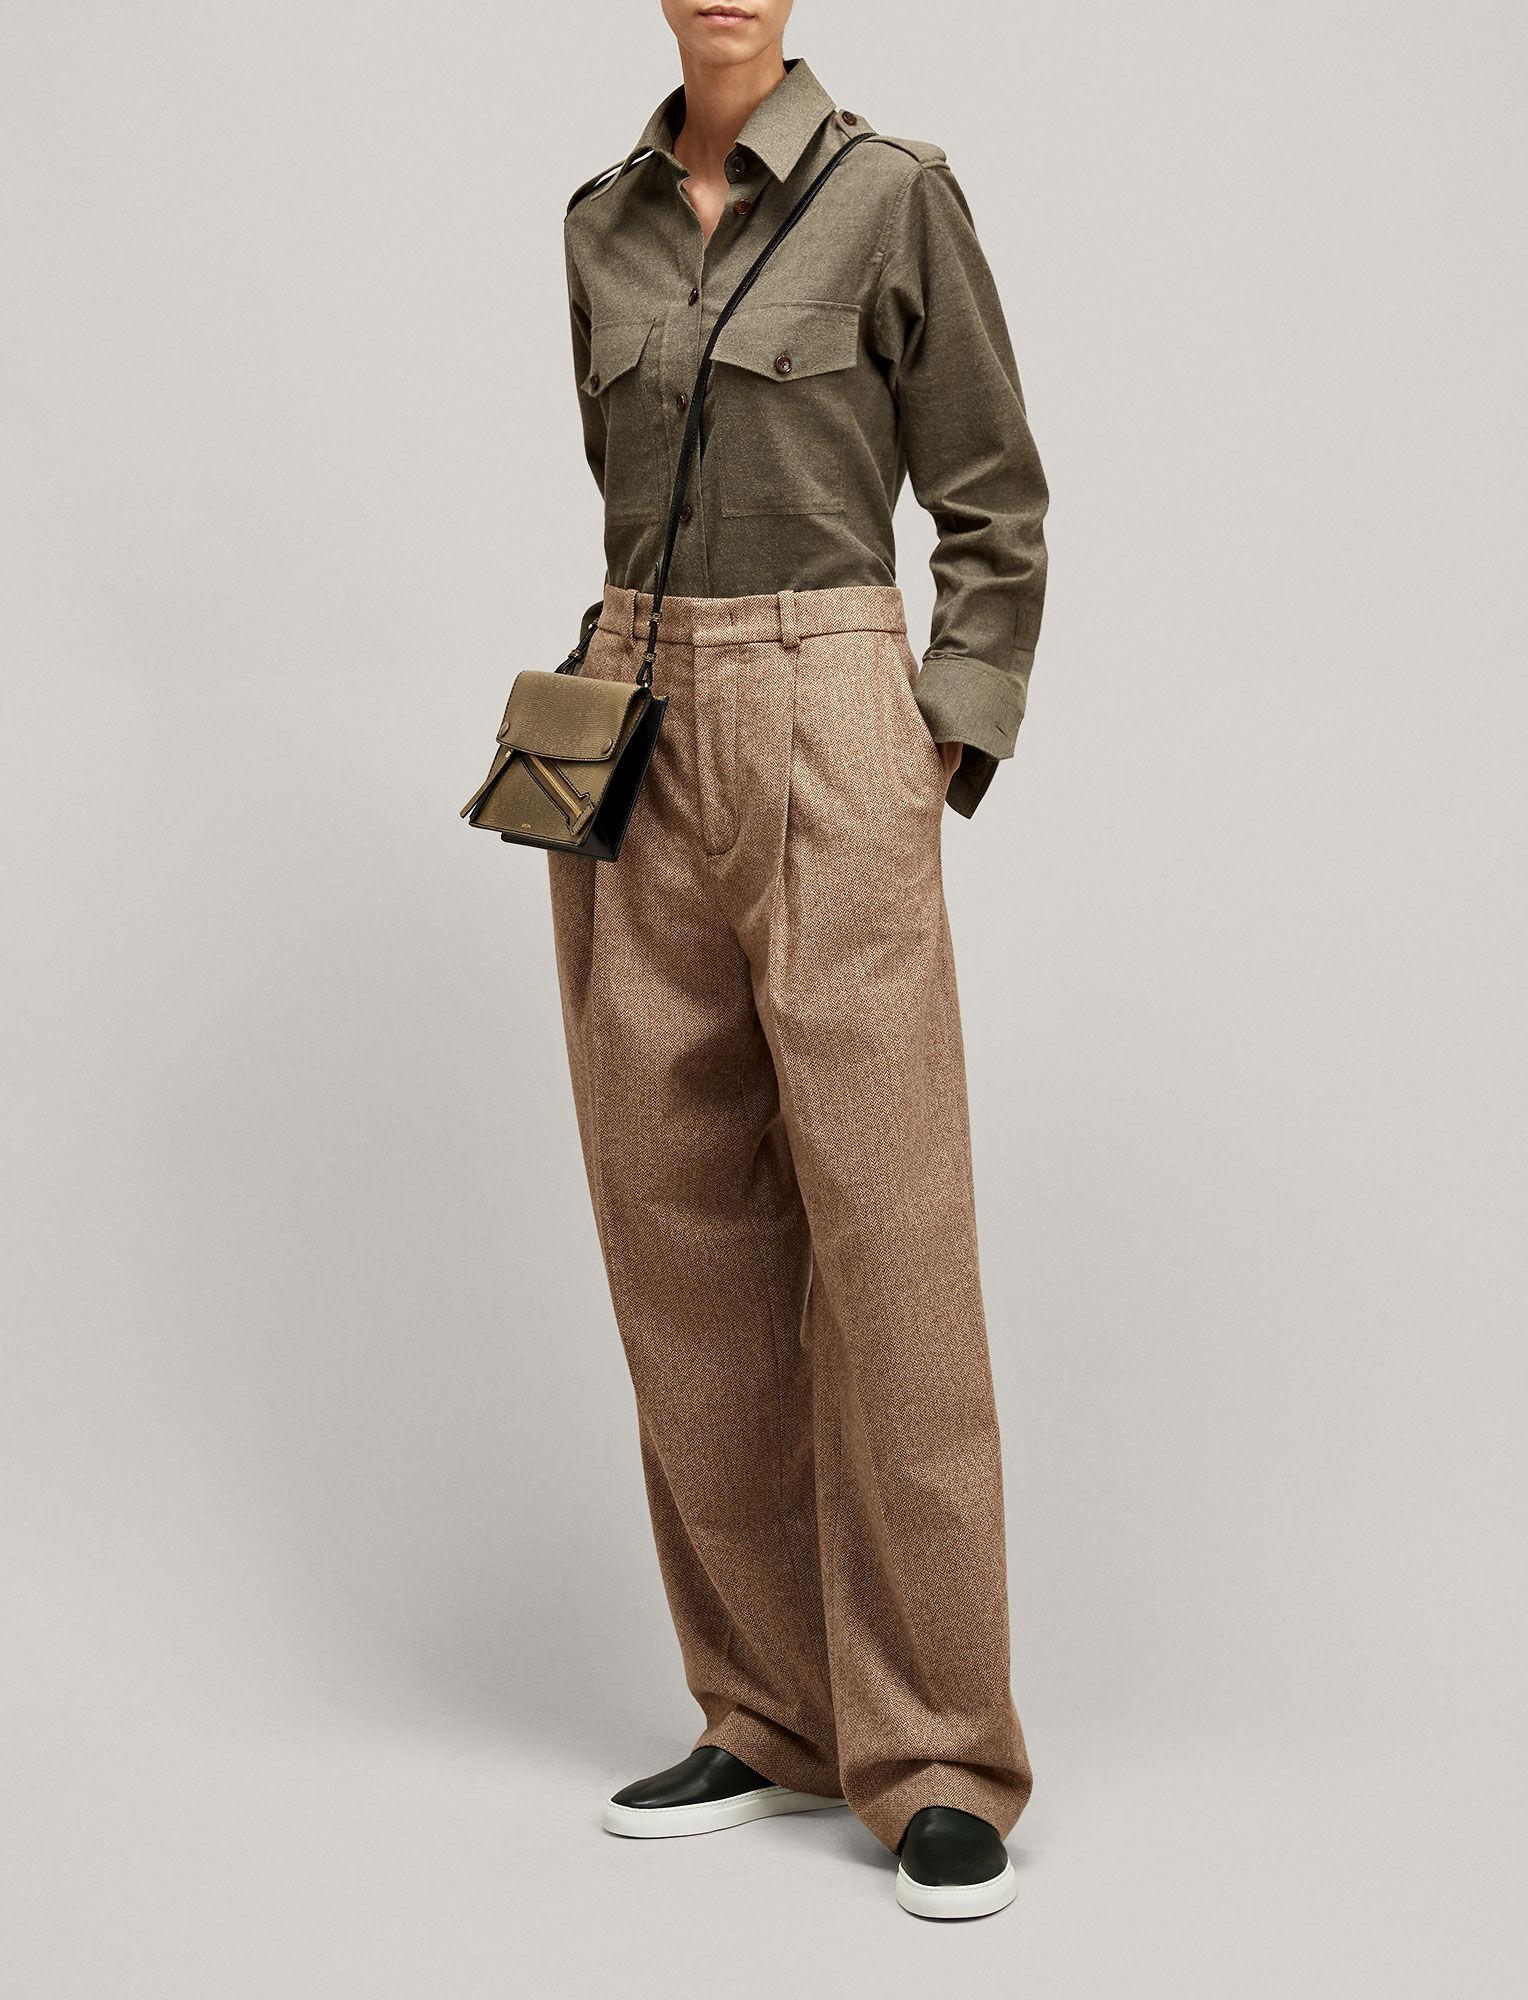 Joseph, Rainer Flannel Shirting Blouse, in ARMY MELANGE